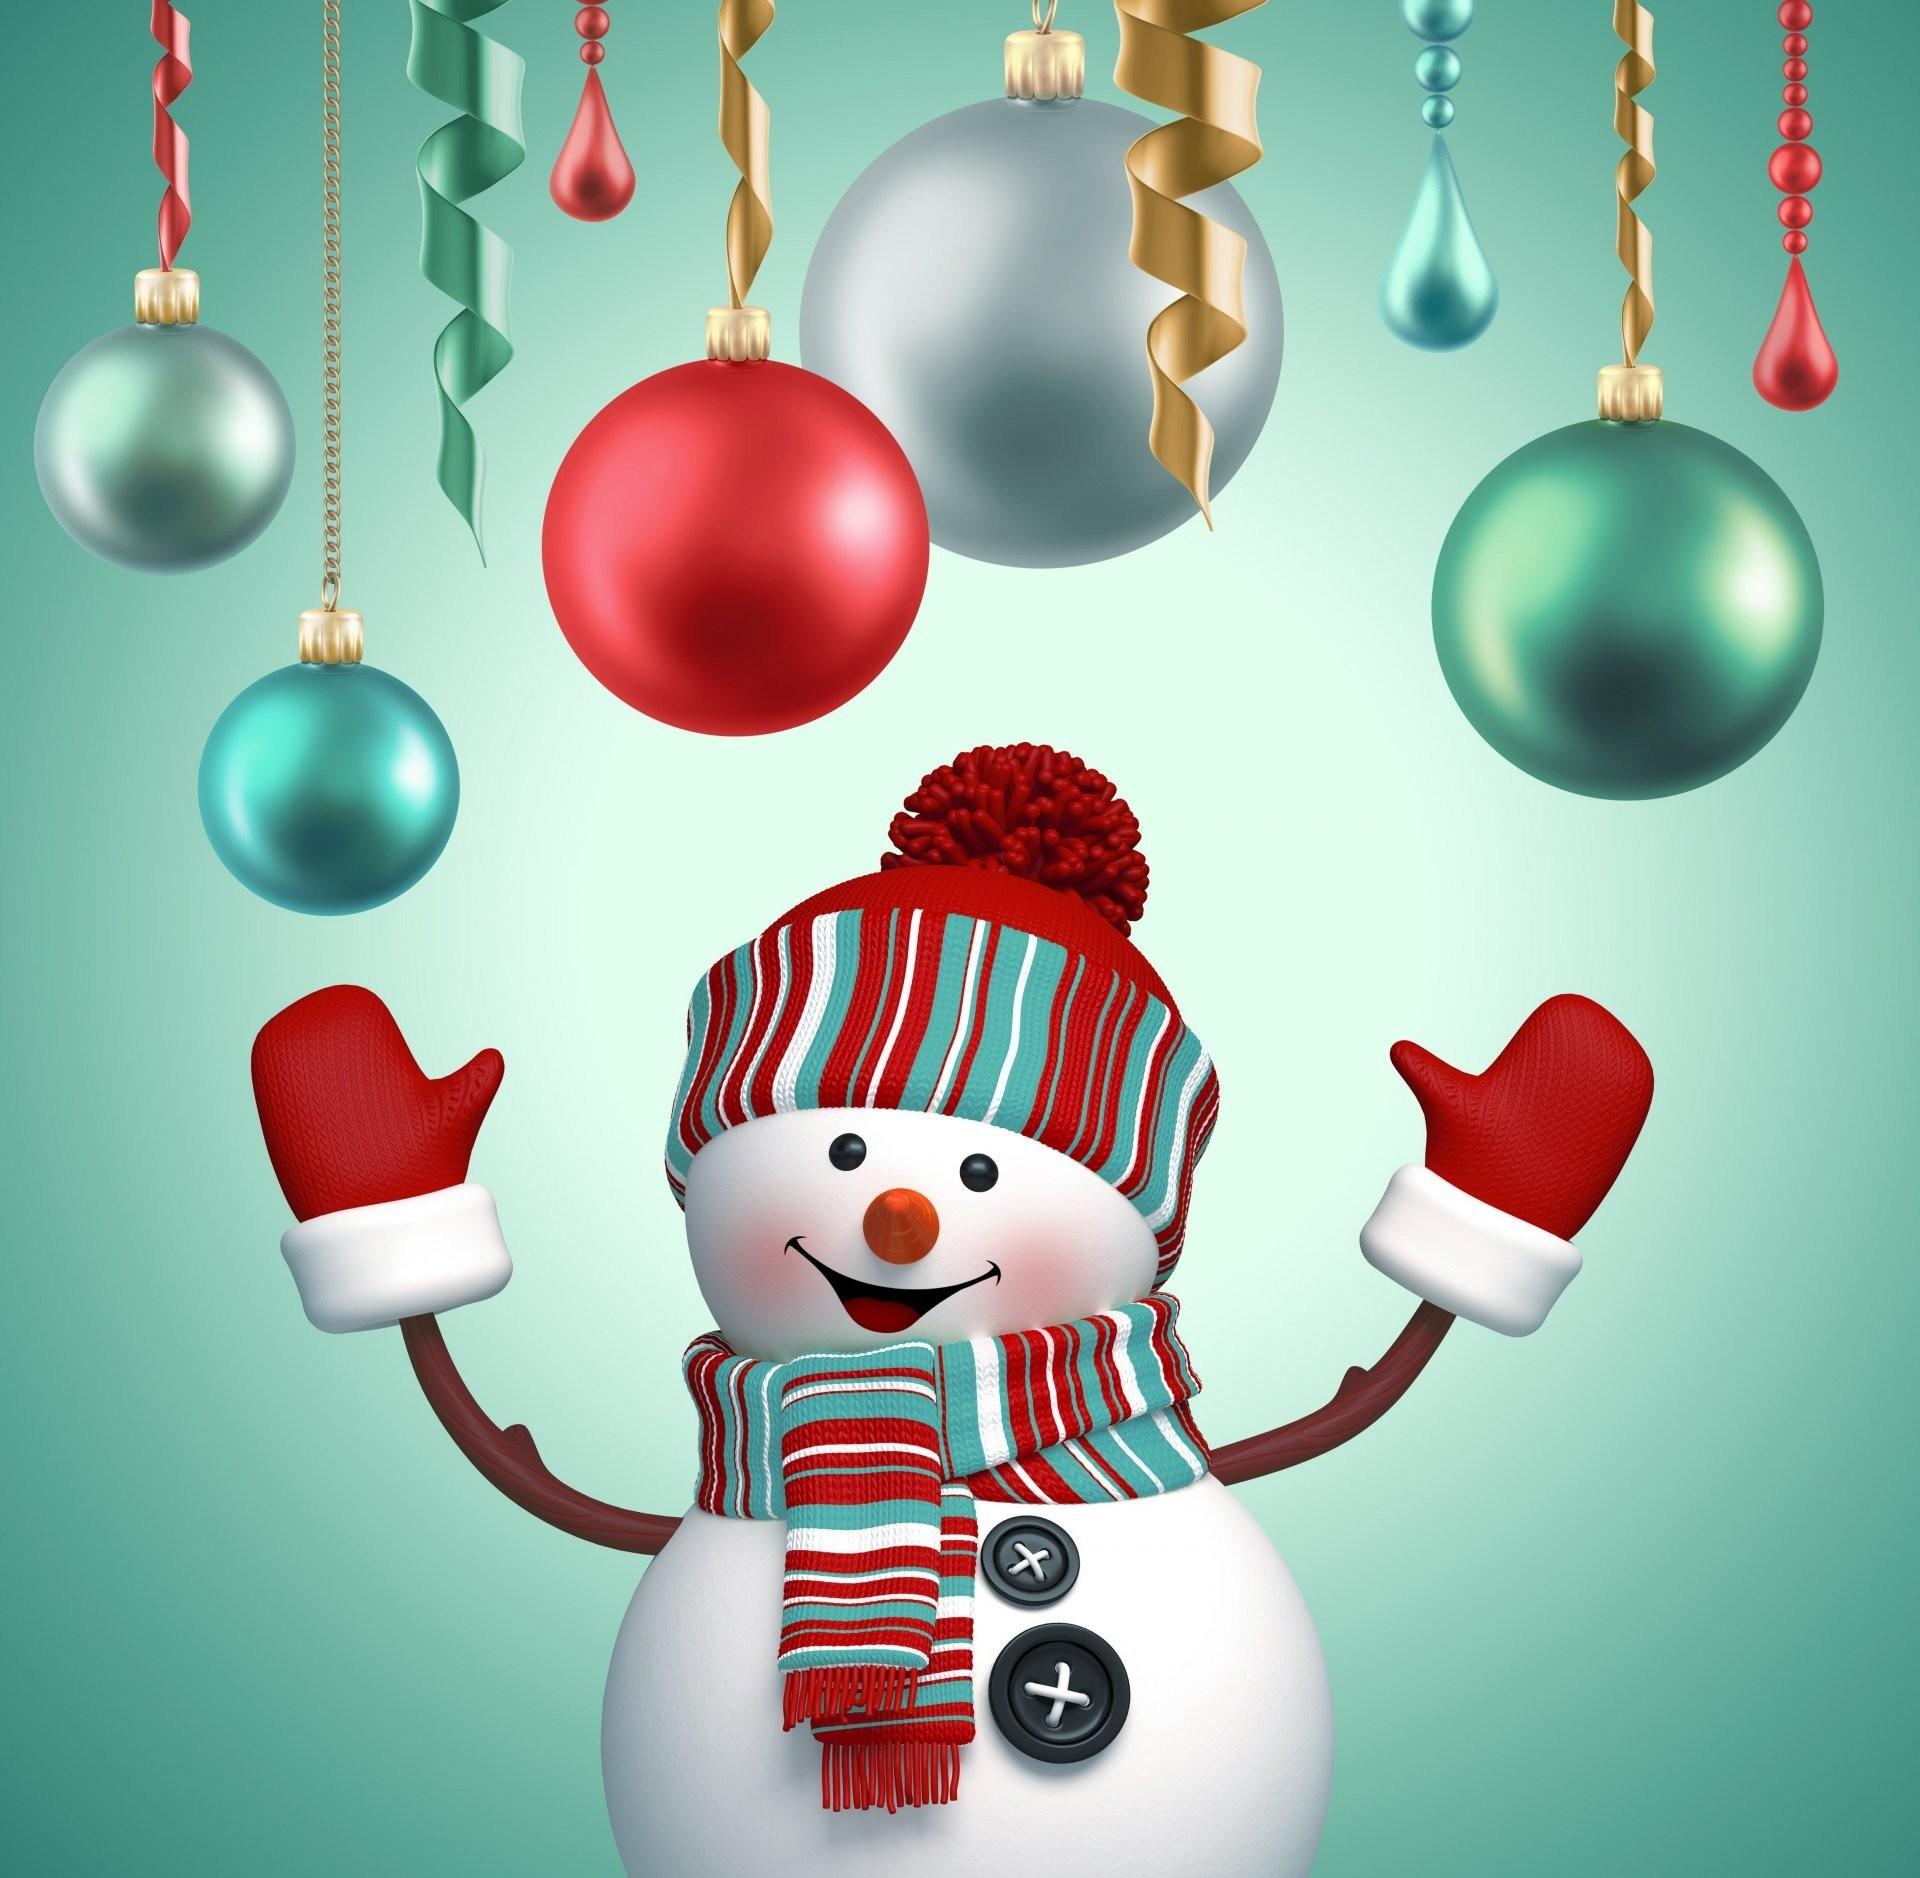 snowman 3d cute merry christmas new year decoration snowman new year  christmas balls